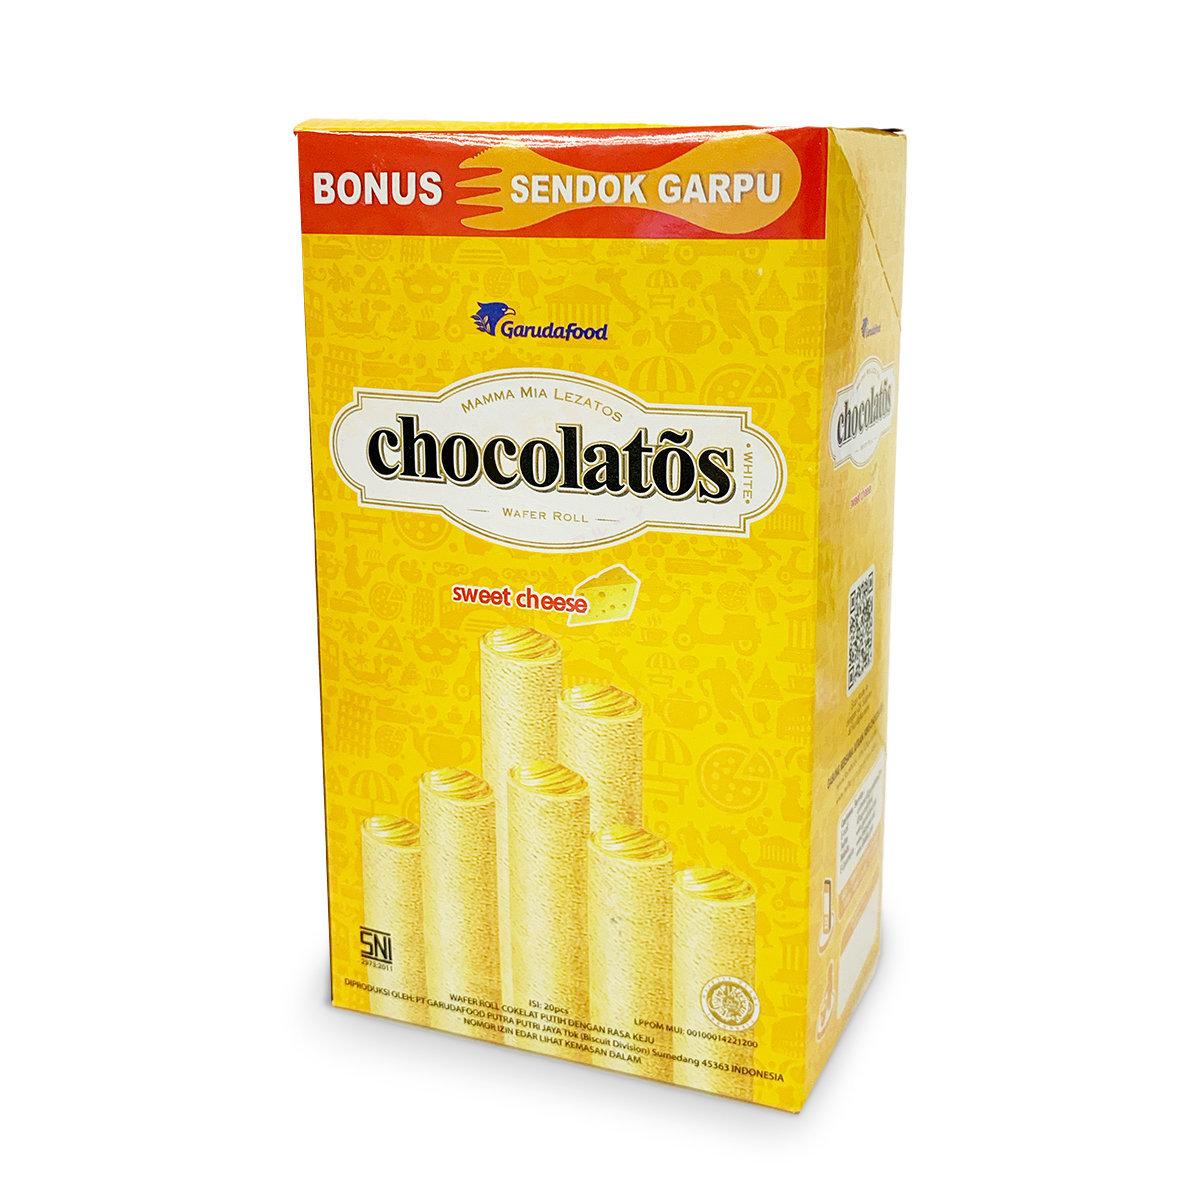 Gery Chocolatos Wafer Roll - Sweet Cheese (20pcs)